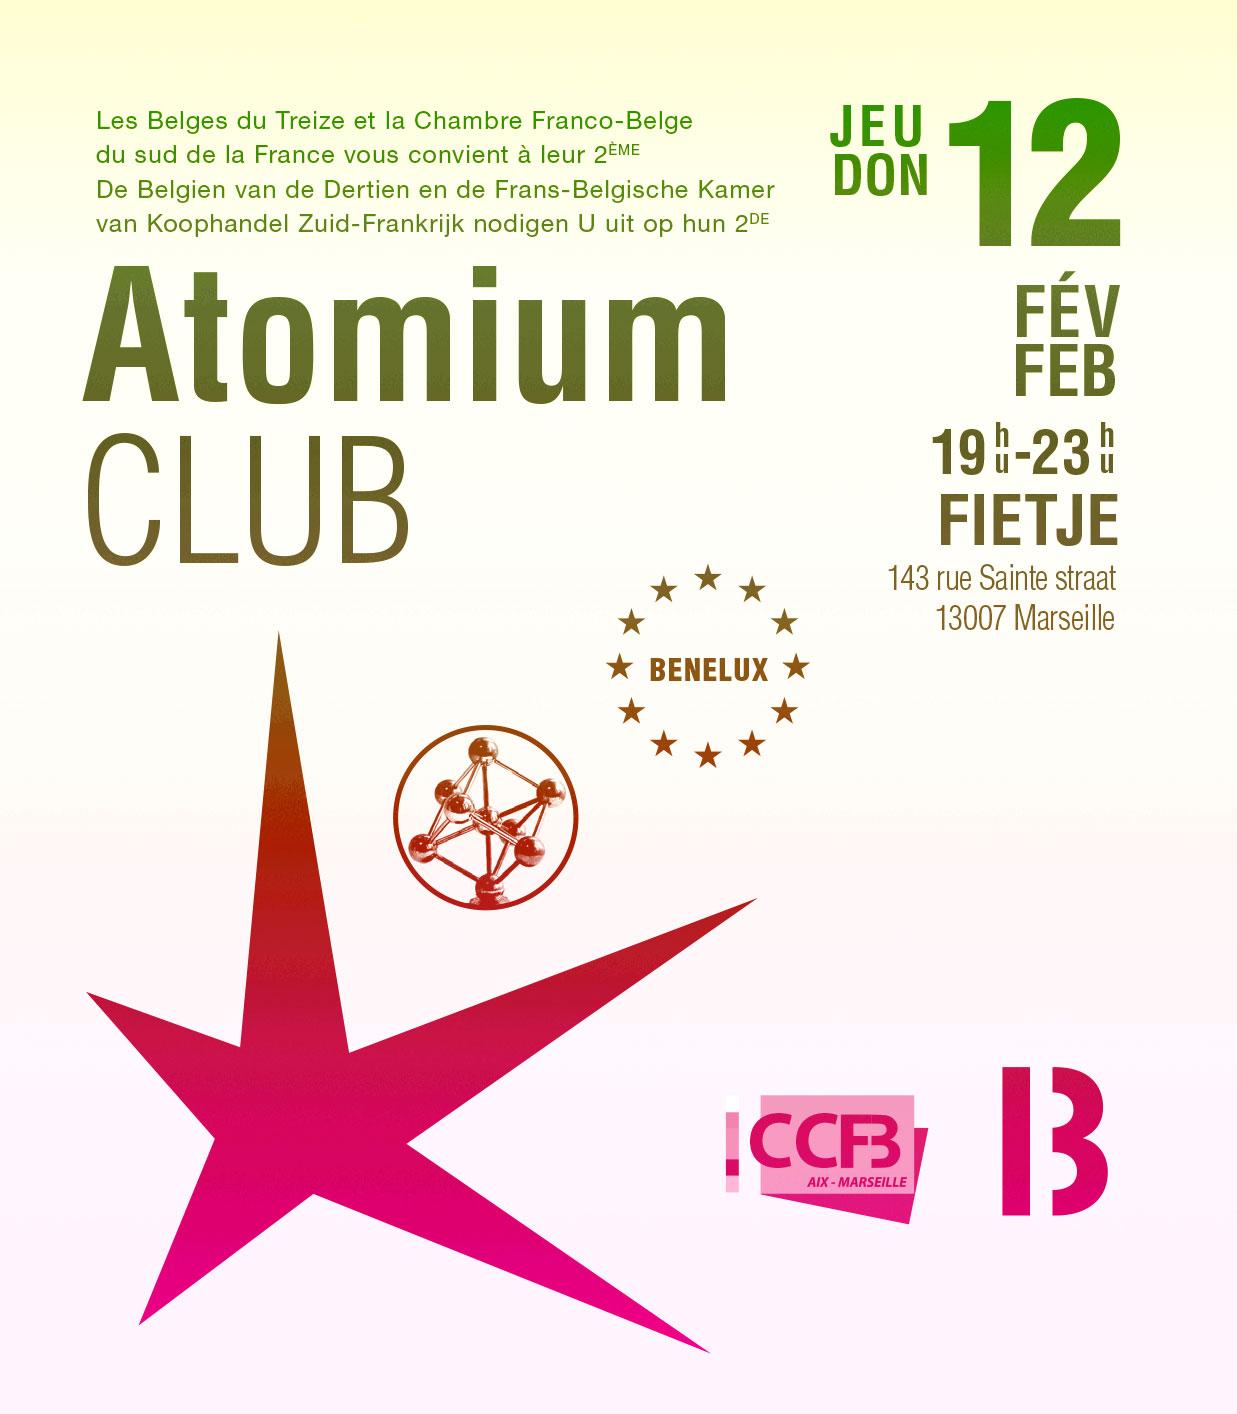 Afterwork atomium club ccfb - Chambre de commerce franco belge ...